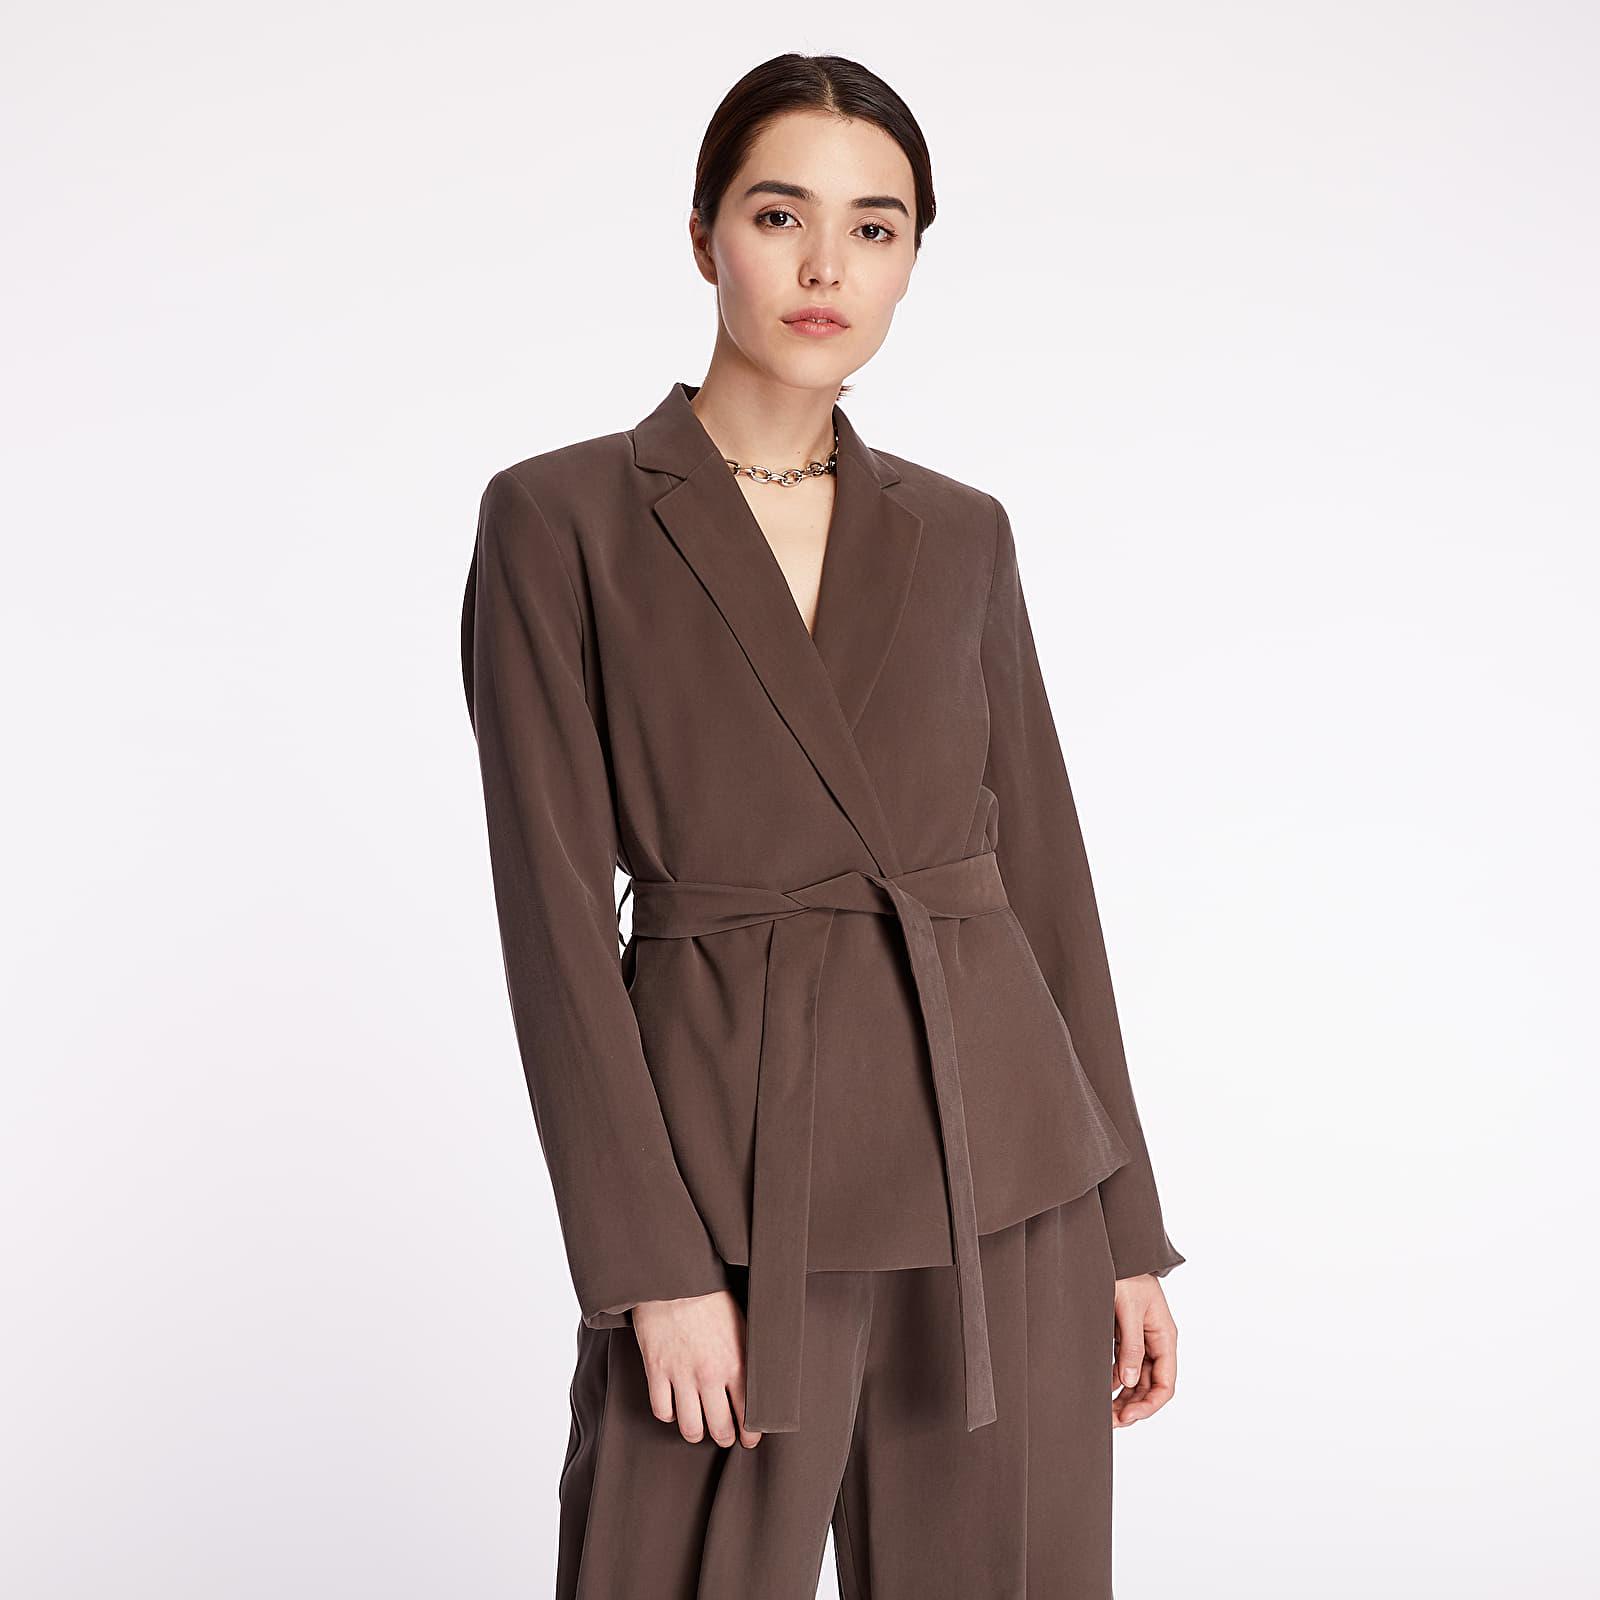 Coats Pietro Filipi Lady's Jacket Brown